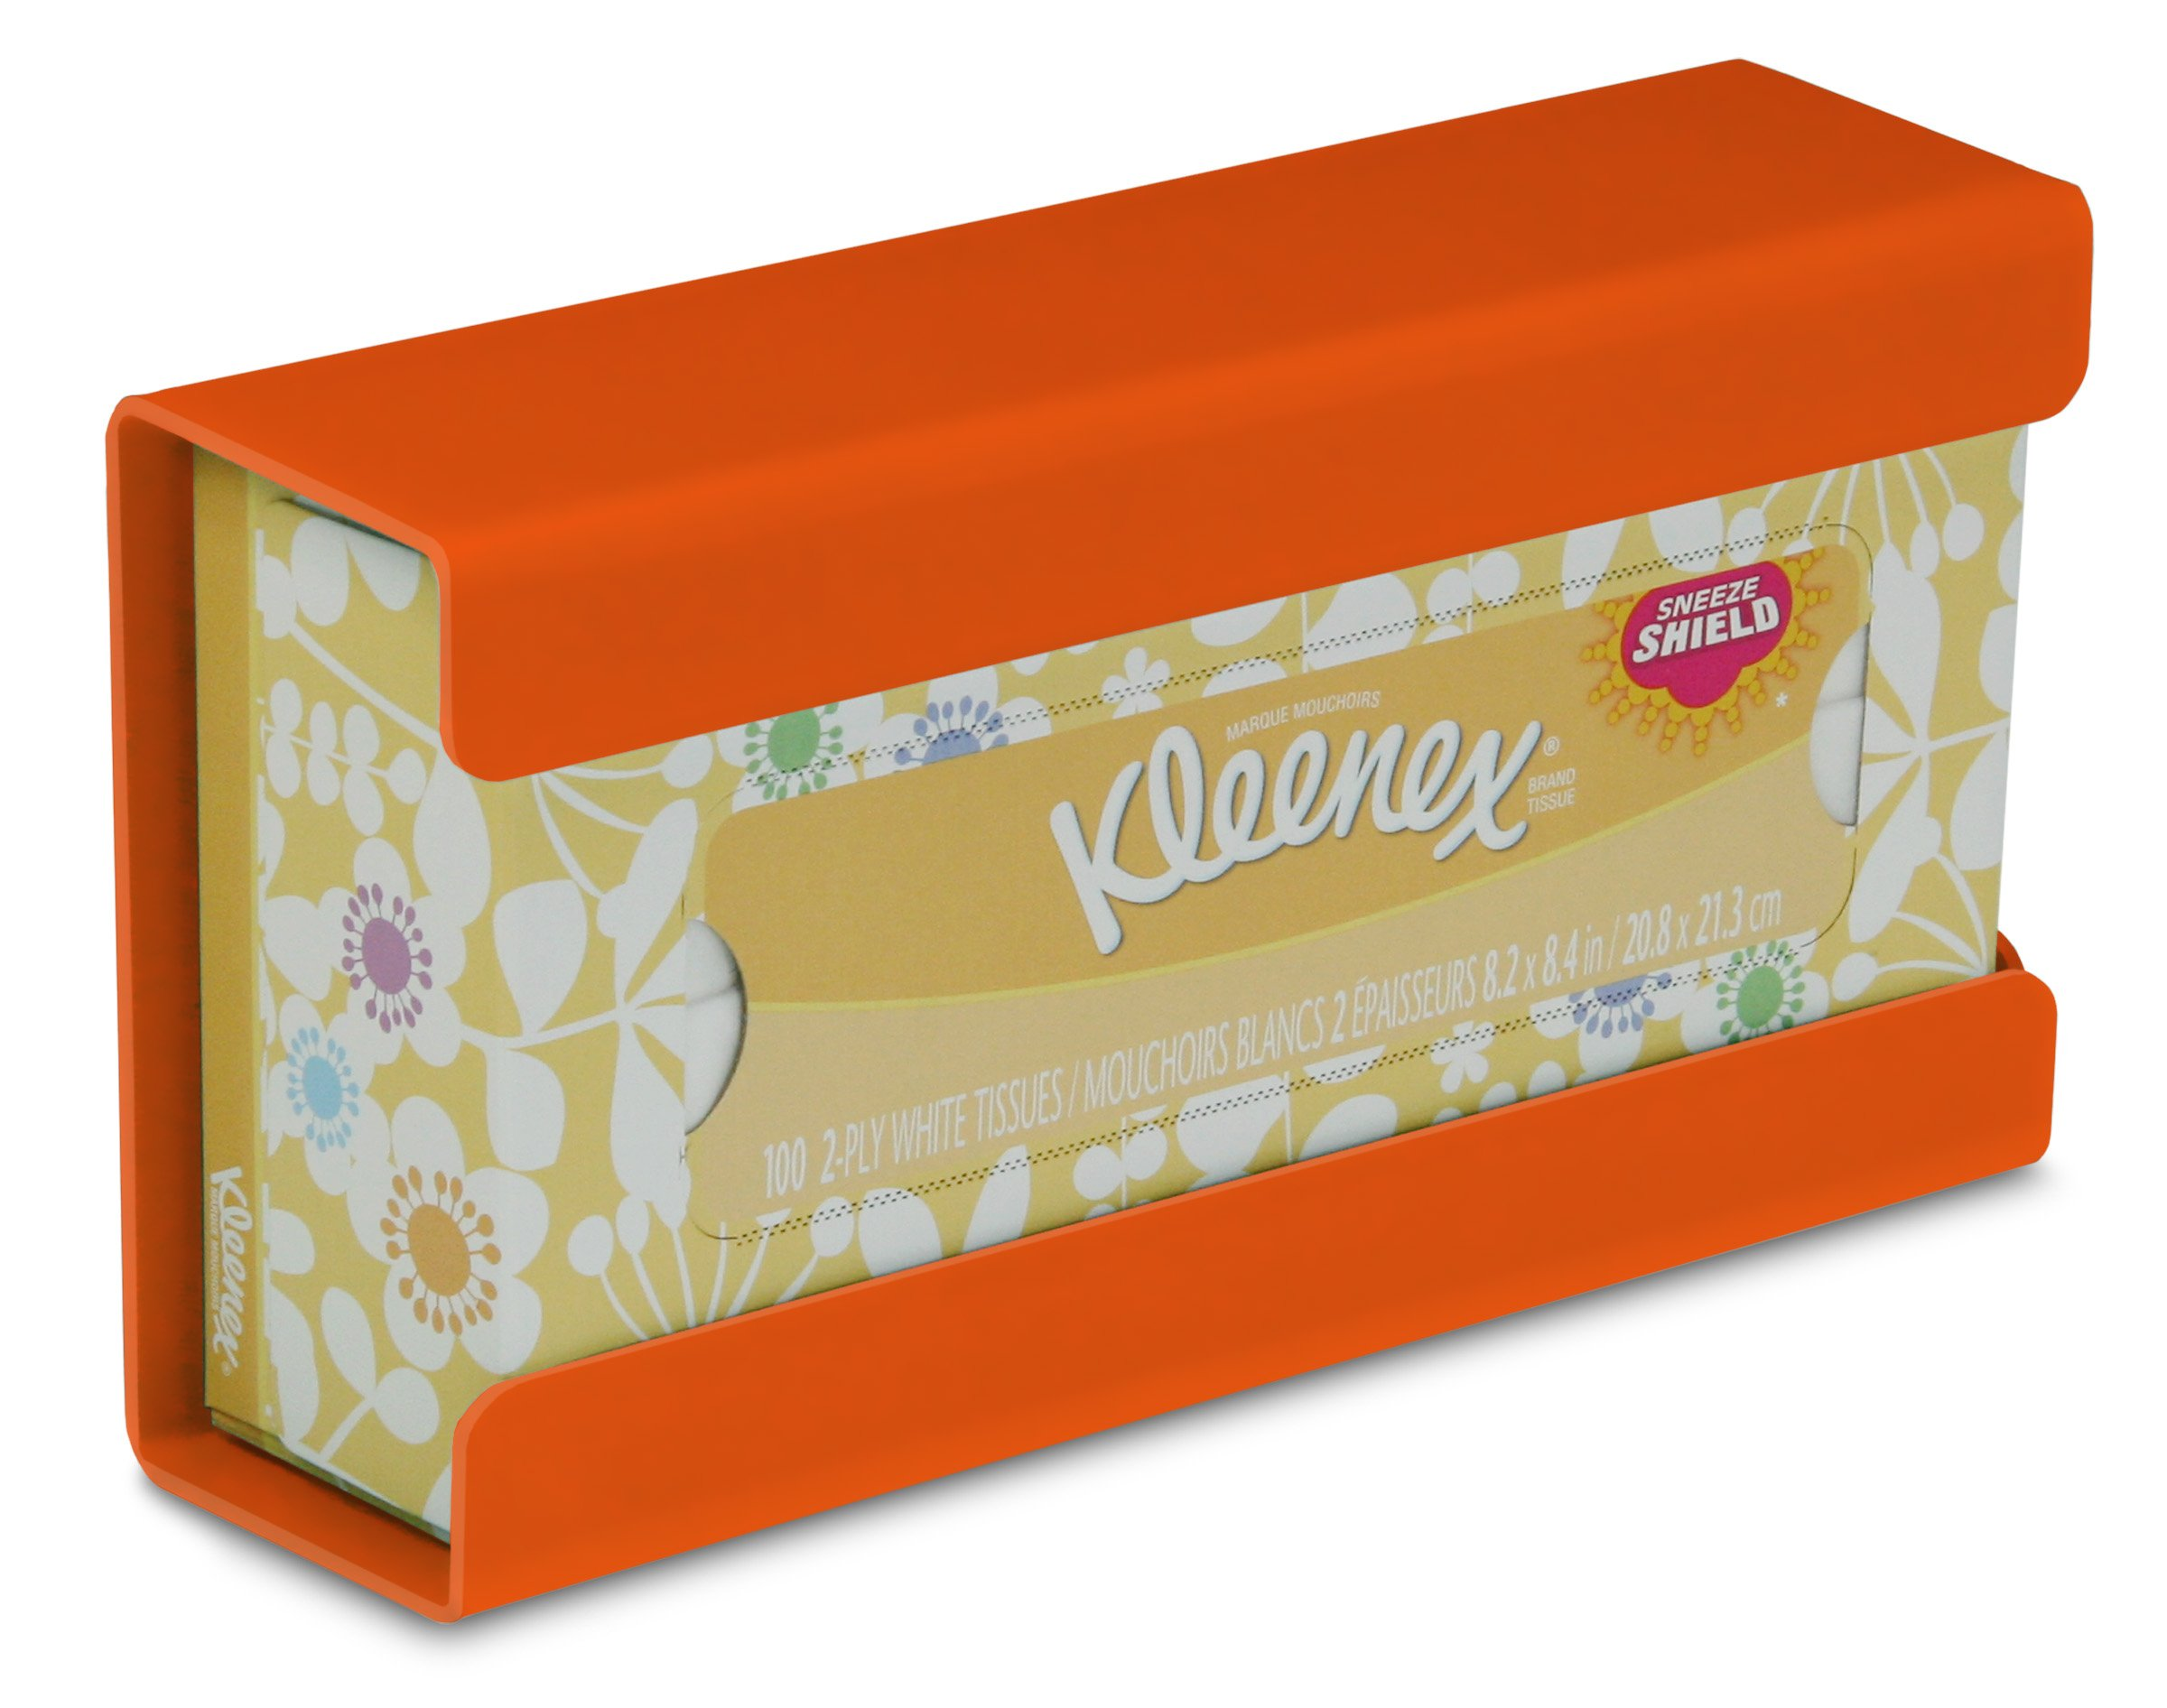 "TrippNT 51209 Plastic Wall Mountable Kleenex Box Holder, 9-7/8"" Width x 5-1/4"" Height x 2-3/4"" Depth, Small, Pumpkin Orange"